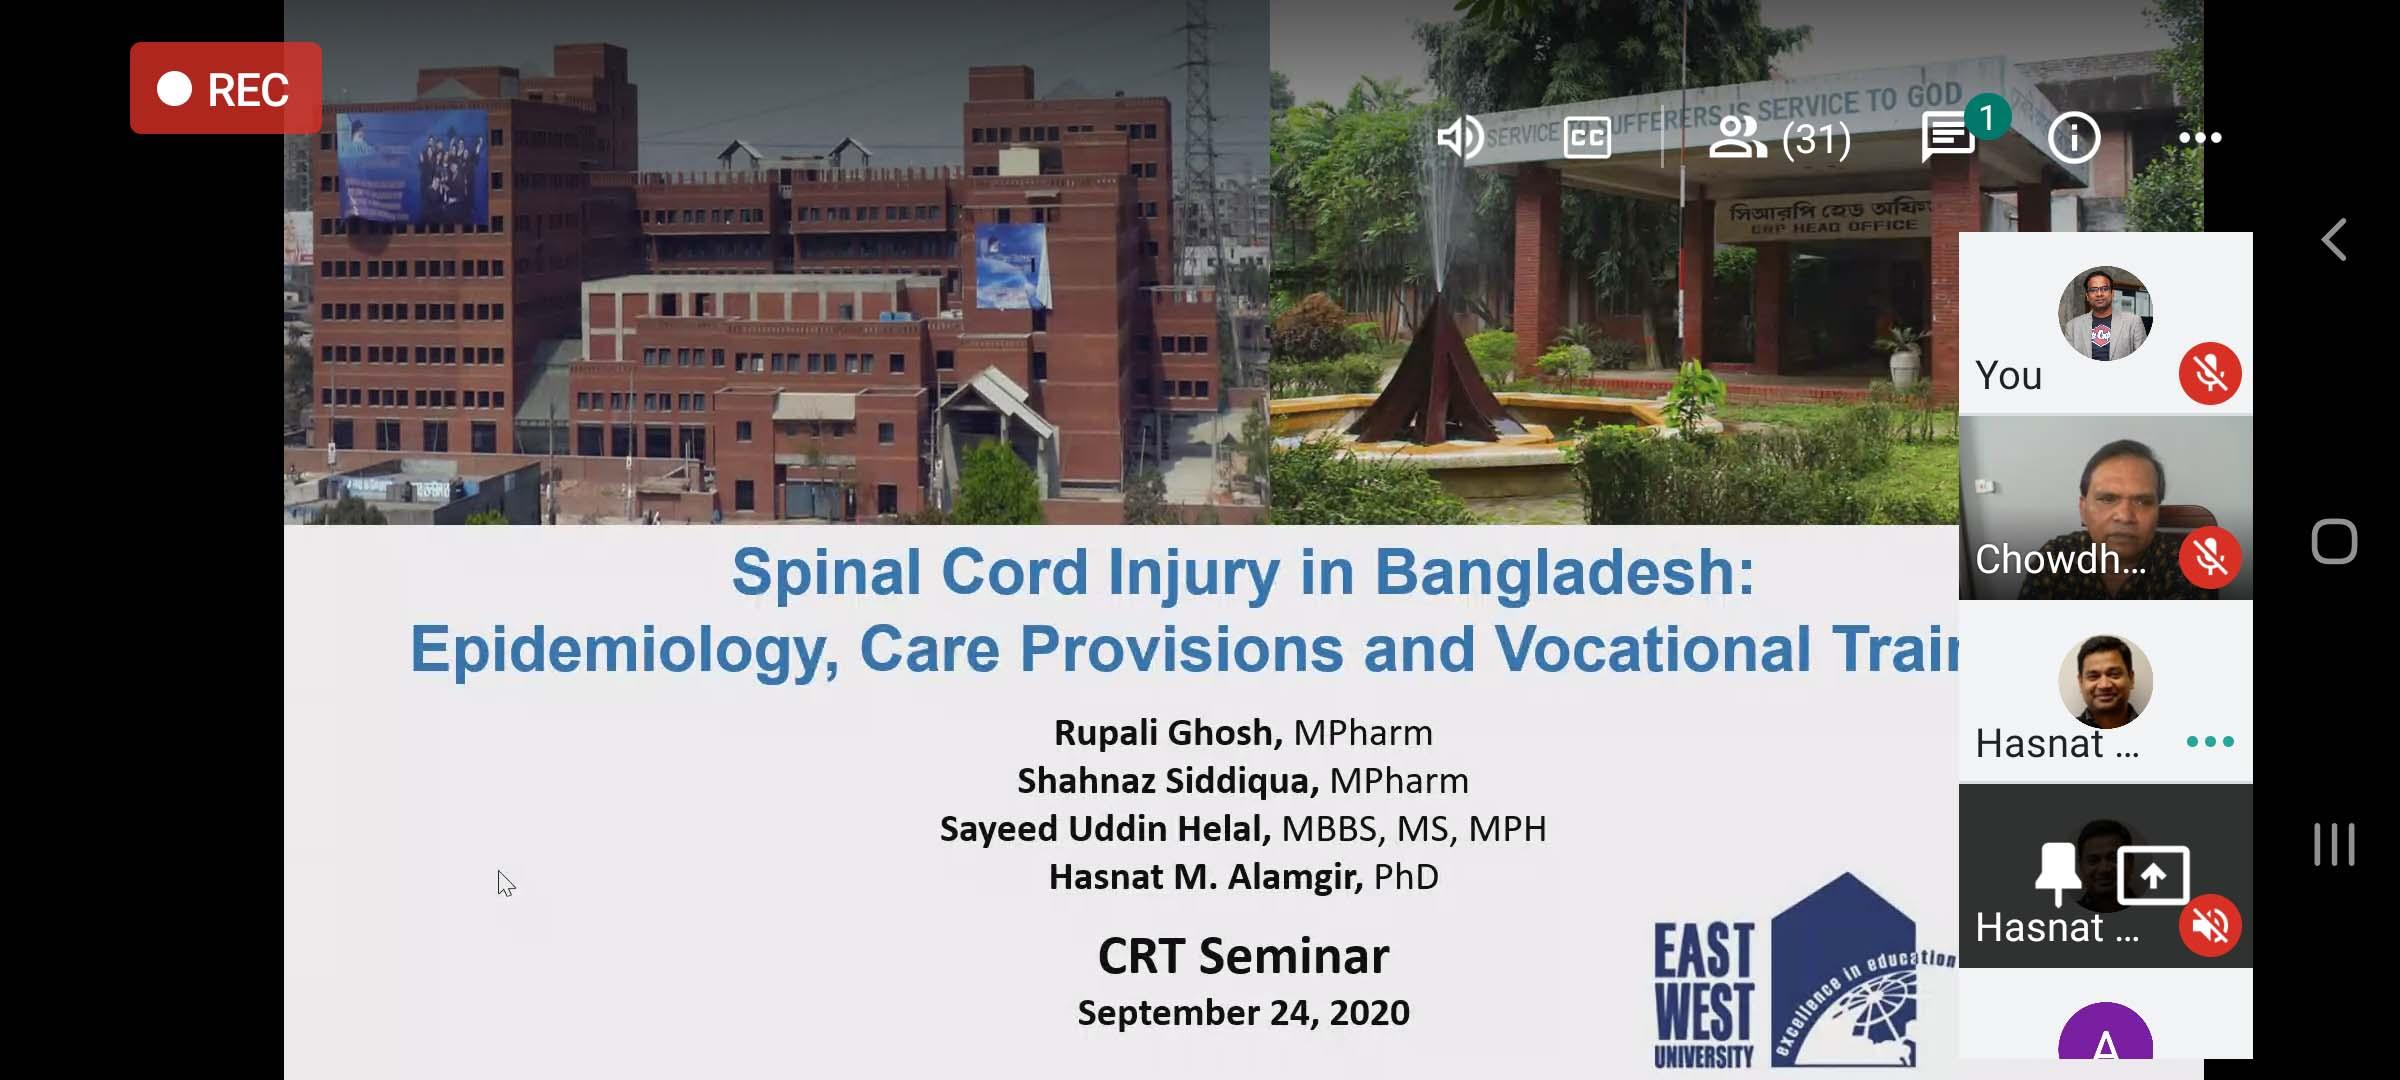 EWUCRT Organised a Research Proposal Seminar